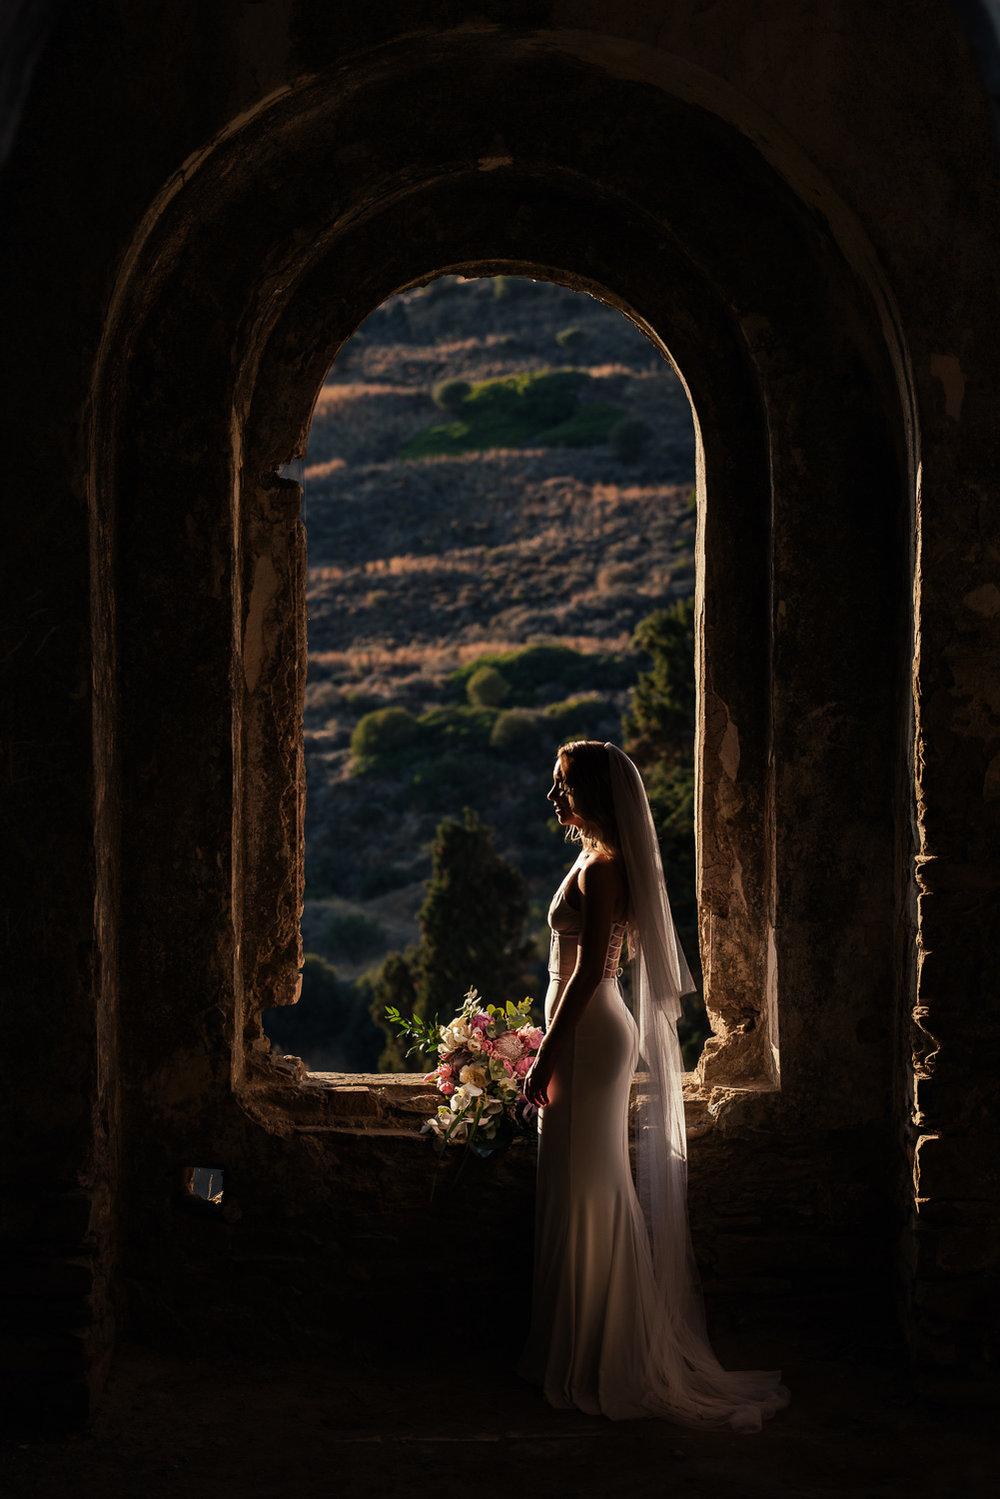 Naxos-Wedding-Marq-Riley-46-lorraine-ciaran-naxos-0333-Q1P_7440-.jpg